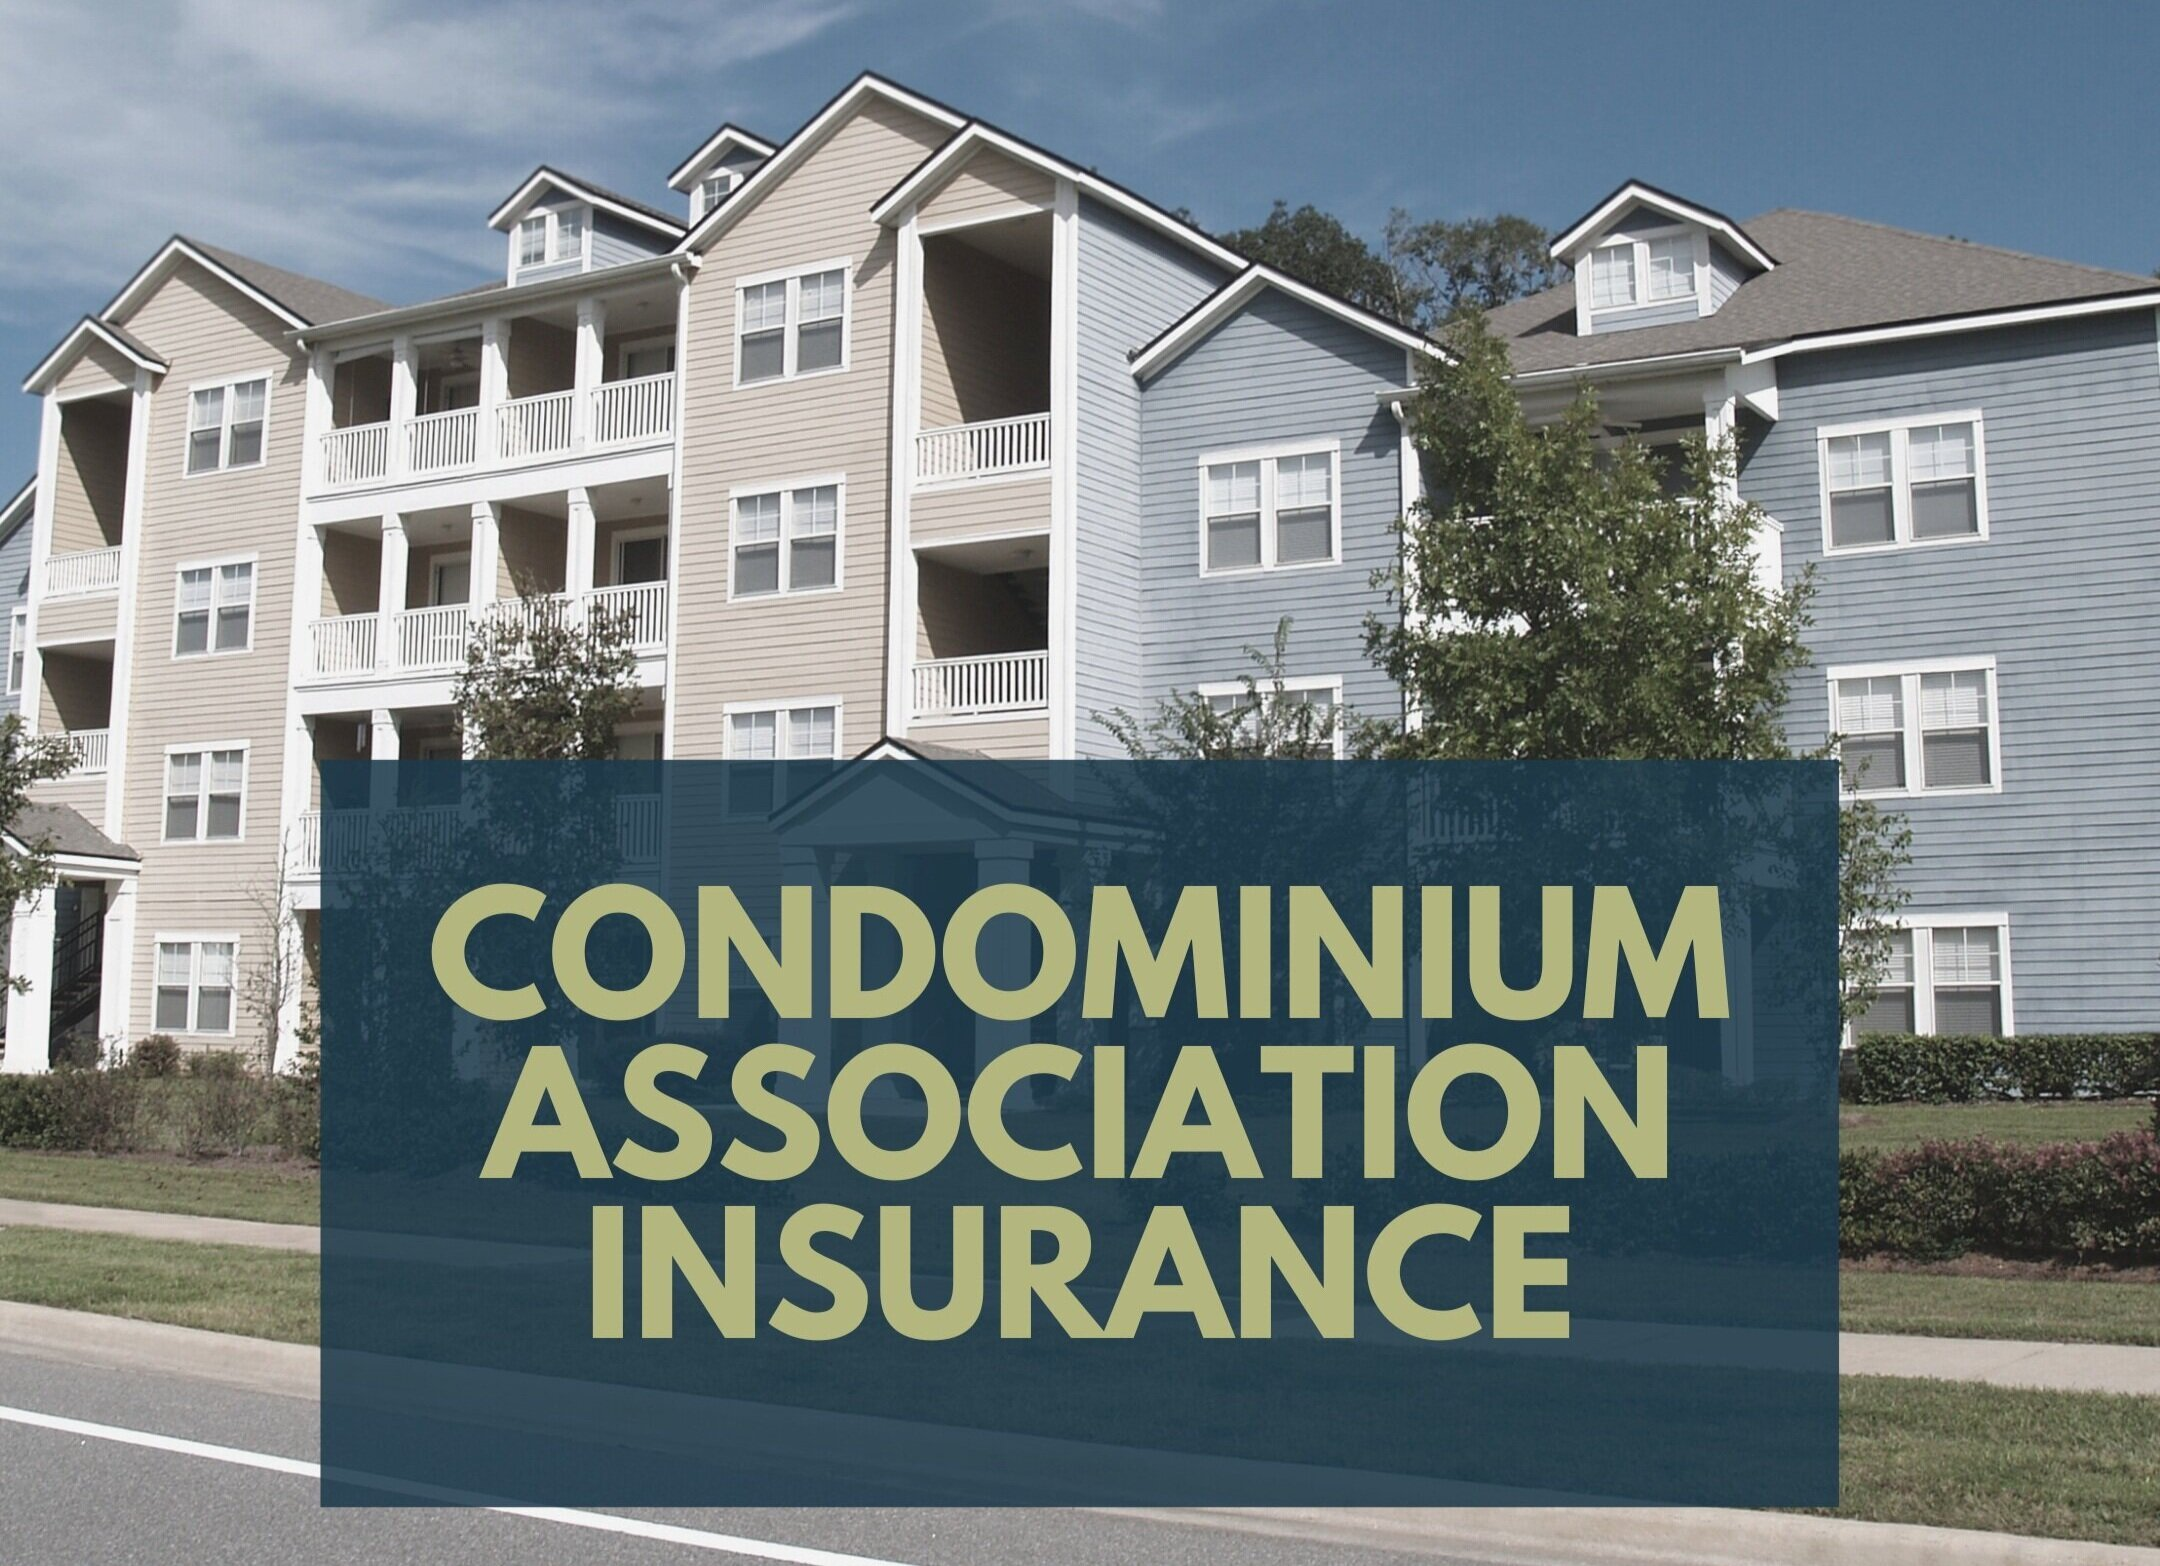 condominium-association-insurance.jpg